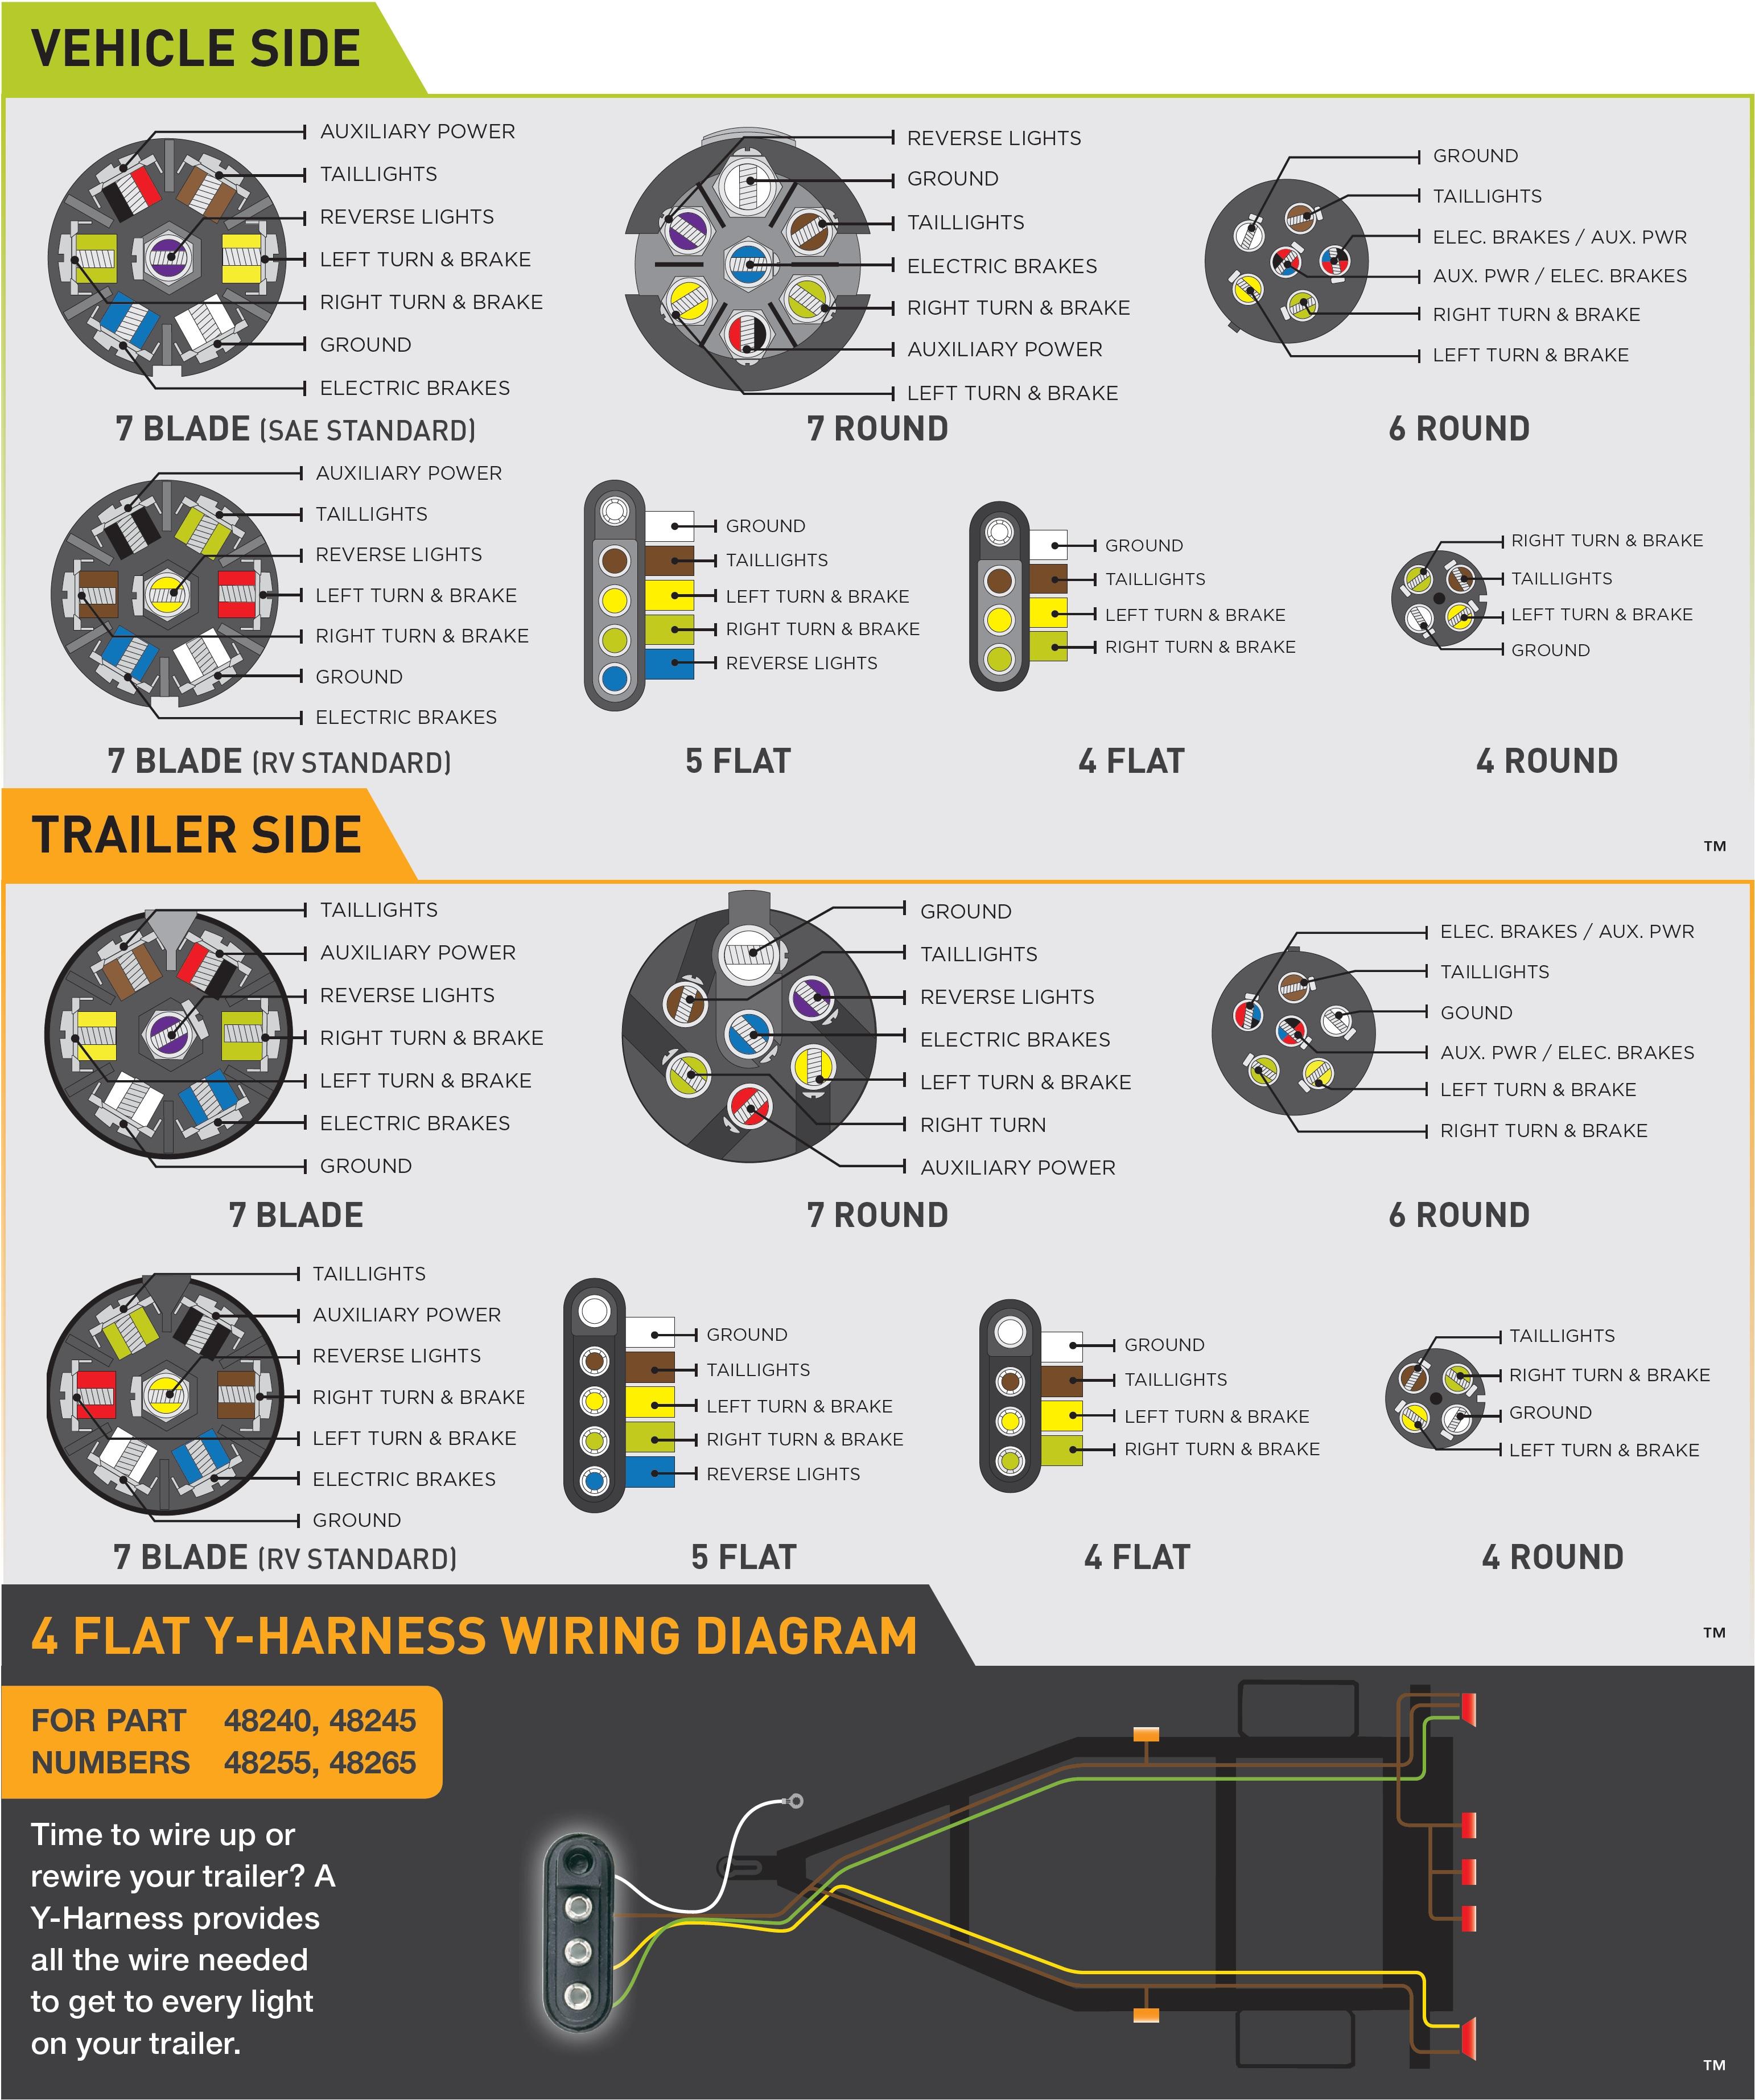 Trailer Wiring Harness Diagram 4 Way | Manual E-Books - Trailer Wiring Harness Diagram